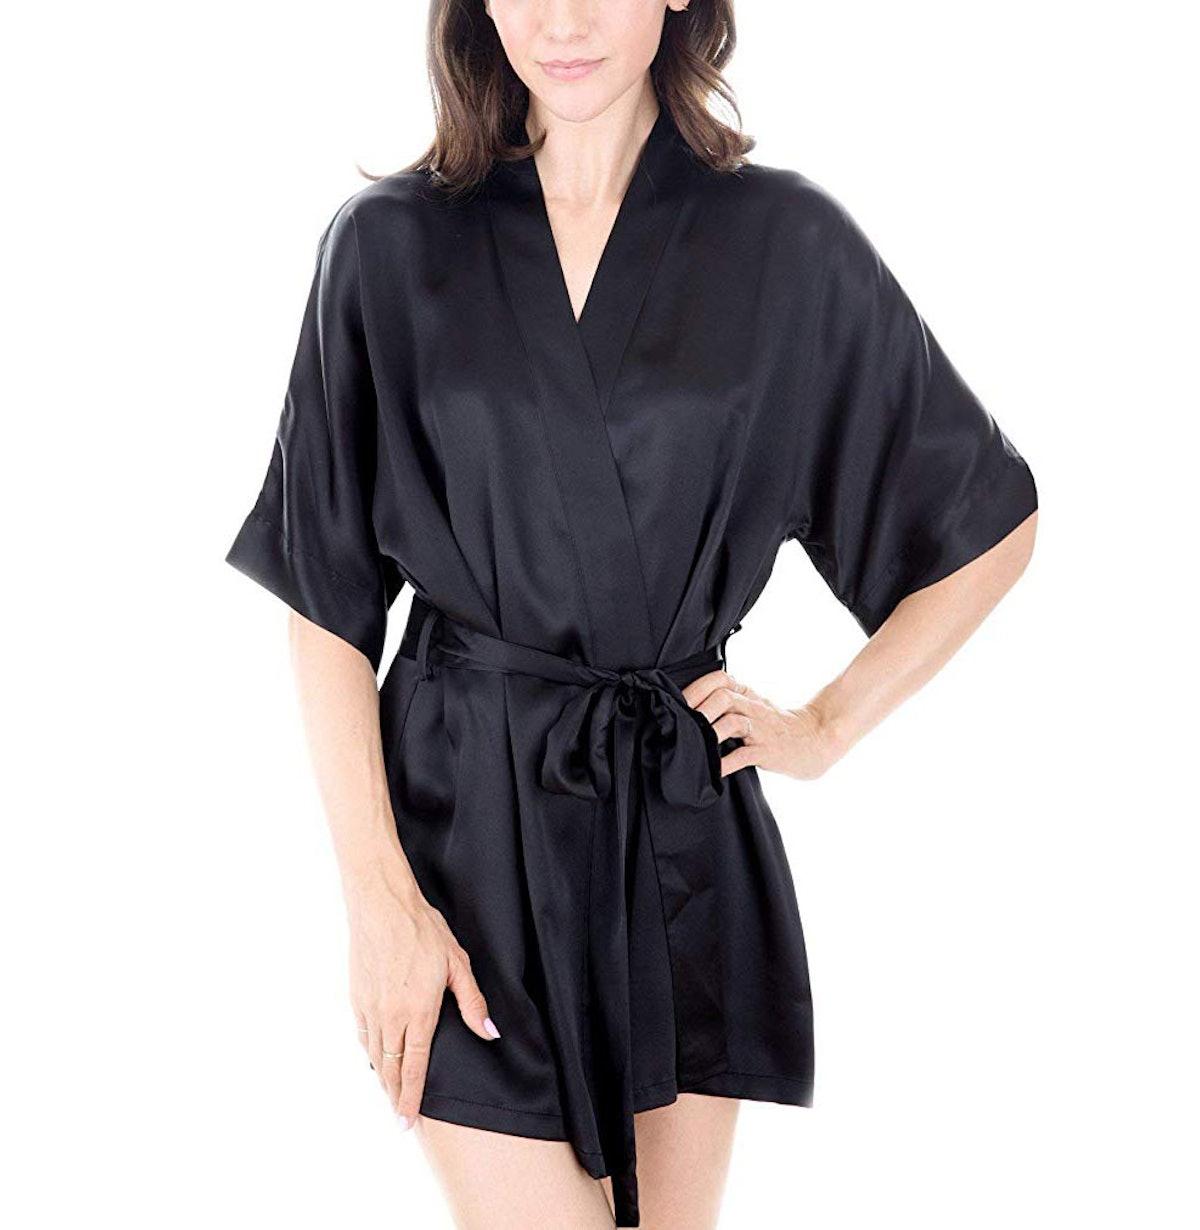 OSCAR ROSSA Luxury Silk Bathrobe